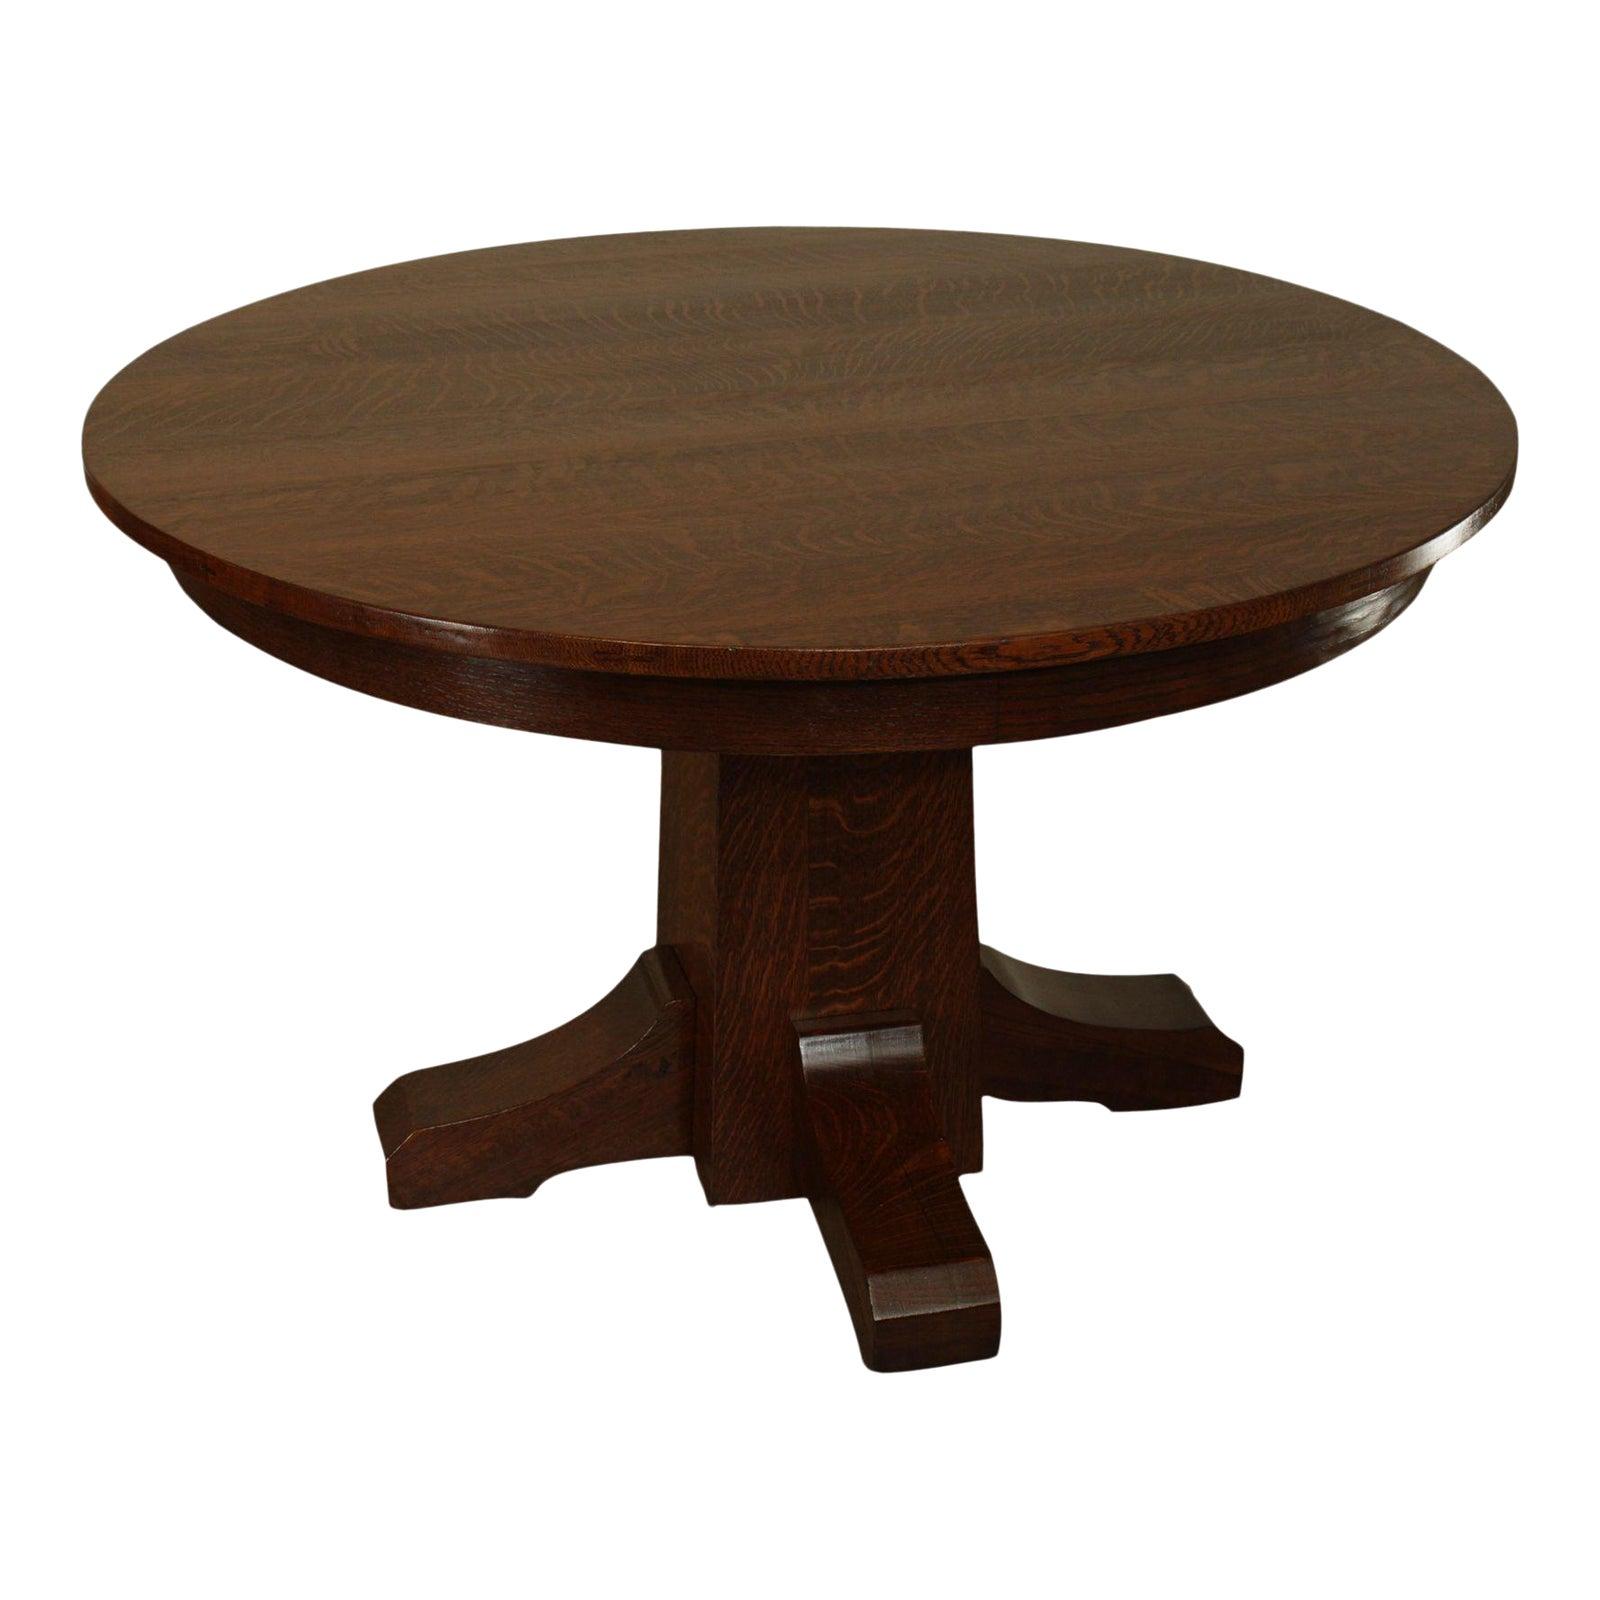 L J G Stickley Antique Mission Oak Arts Crafts 48 Round Pedestal Dining Table Chairish